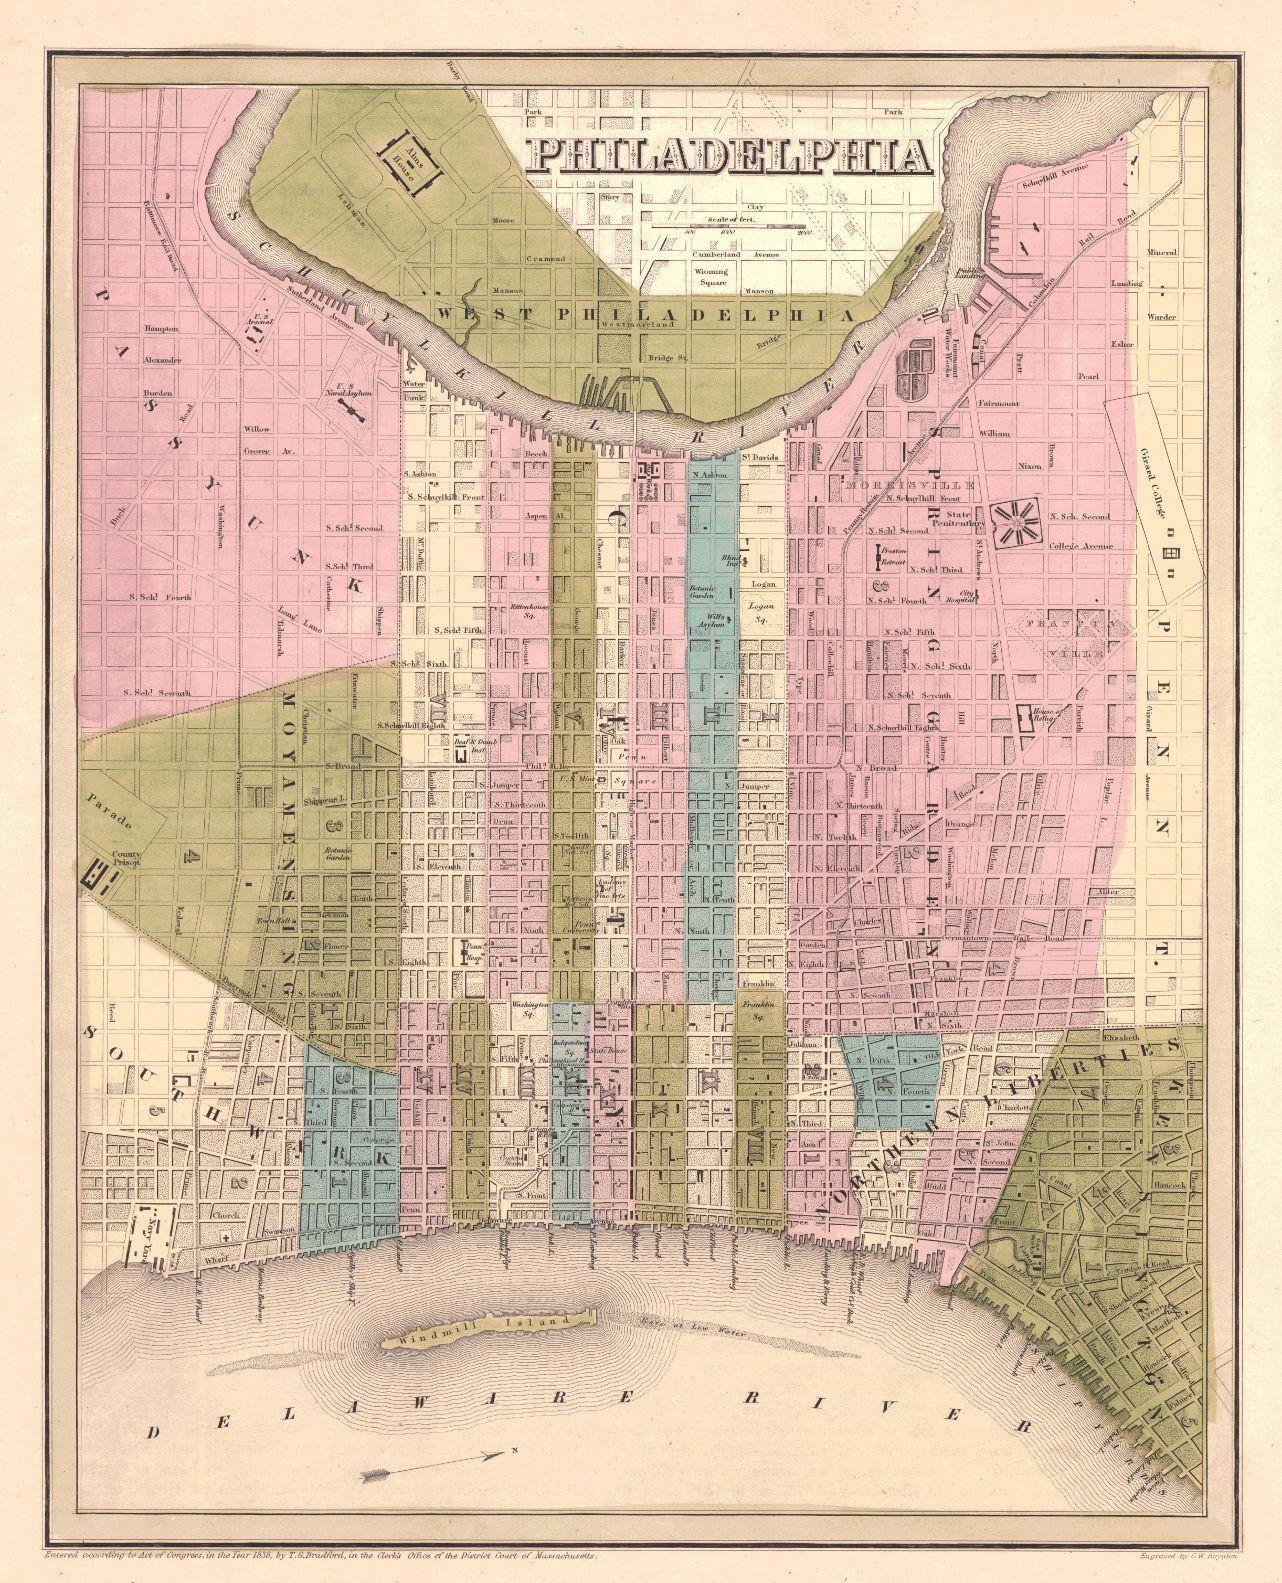 Philadelphia. T.G. Bradford. 1838. Map showing districts separately ...